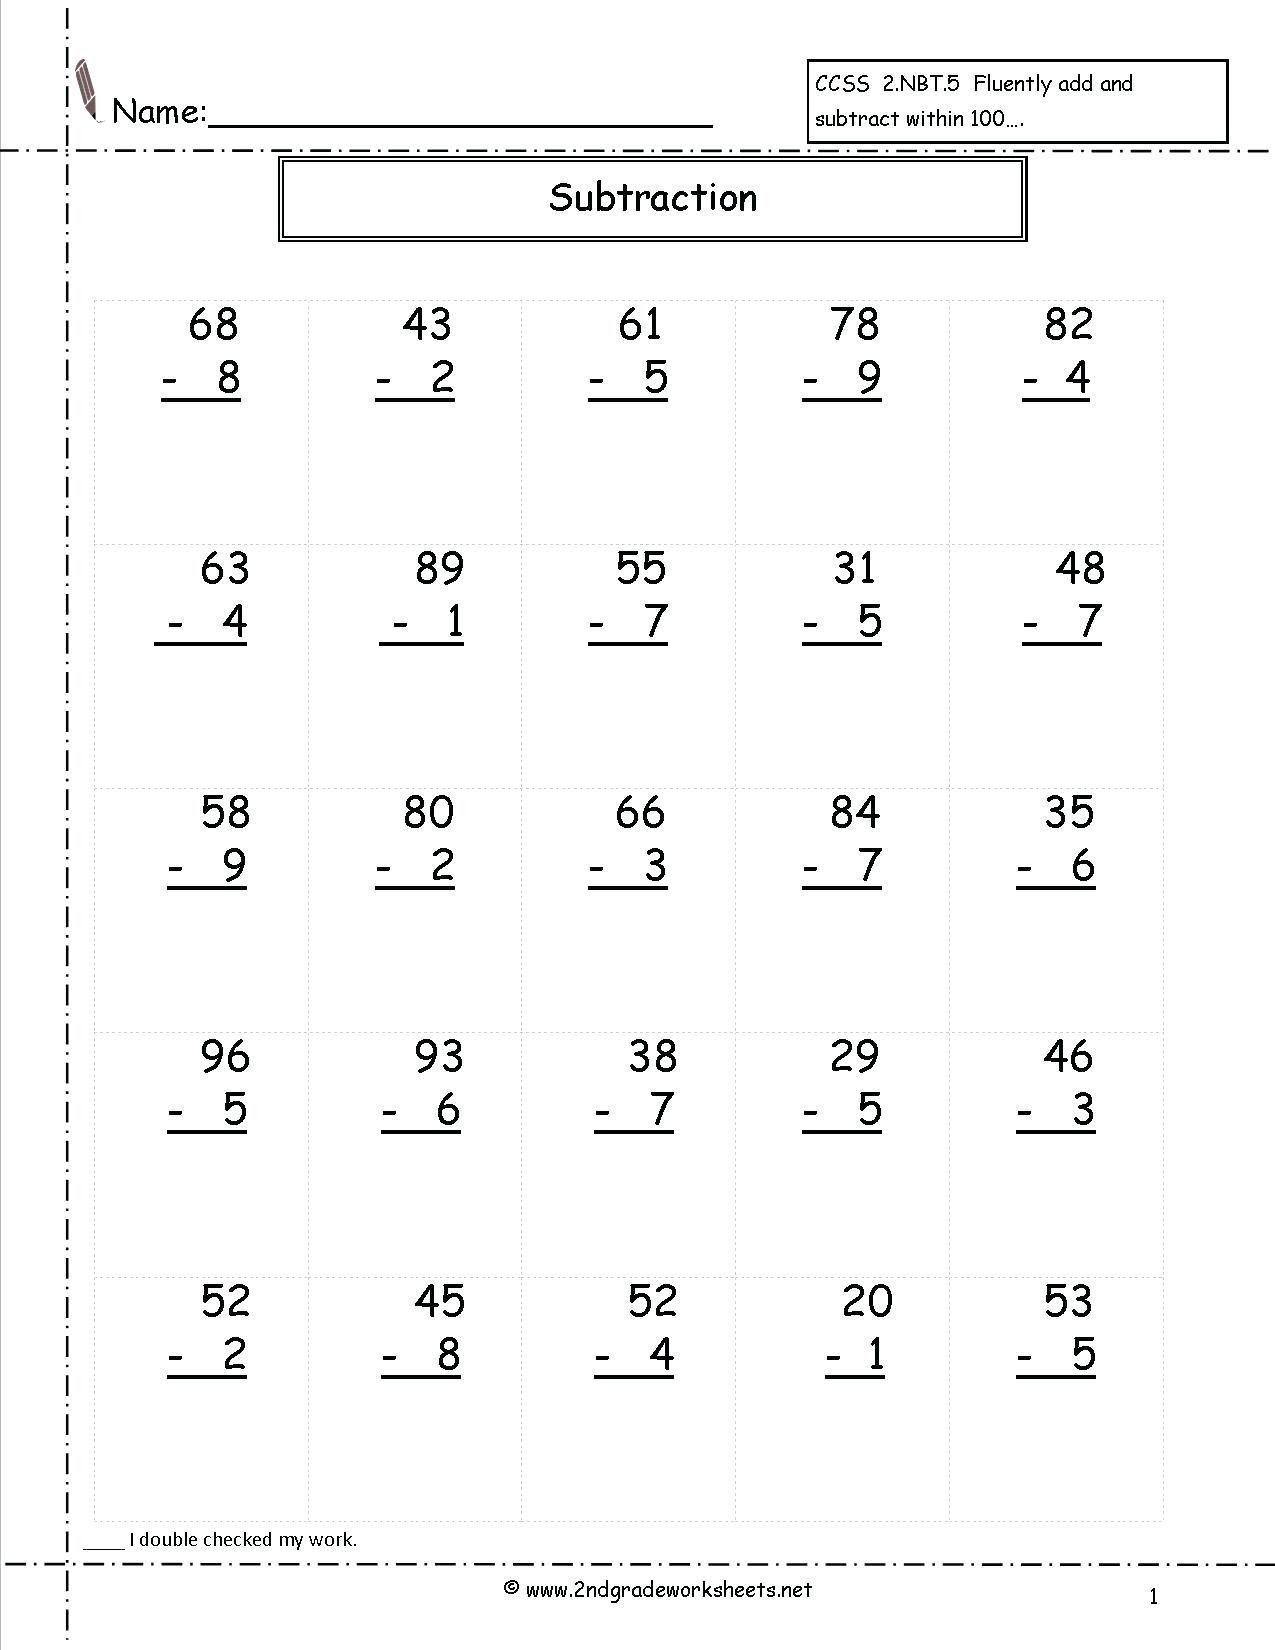 5 Digits Subtraction Worksheet   Printable Worksheets and Activities for  Teachers [ 1650 x 1275 Pixel ]